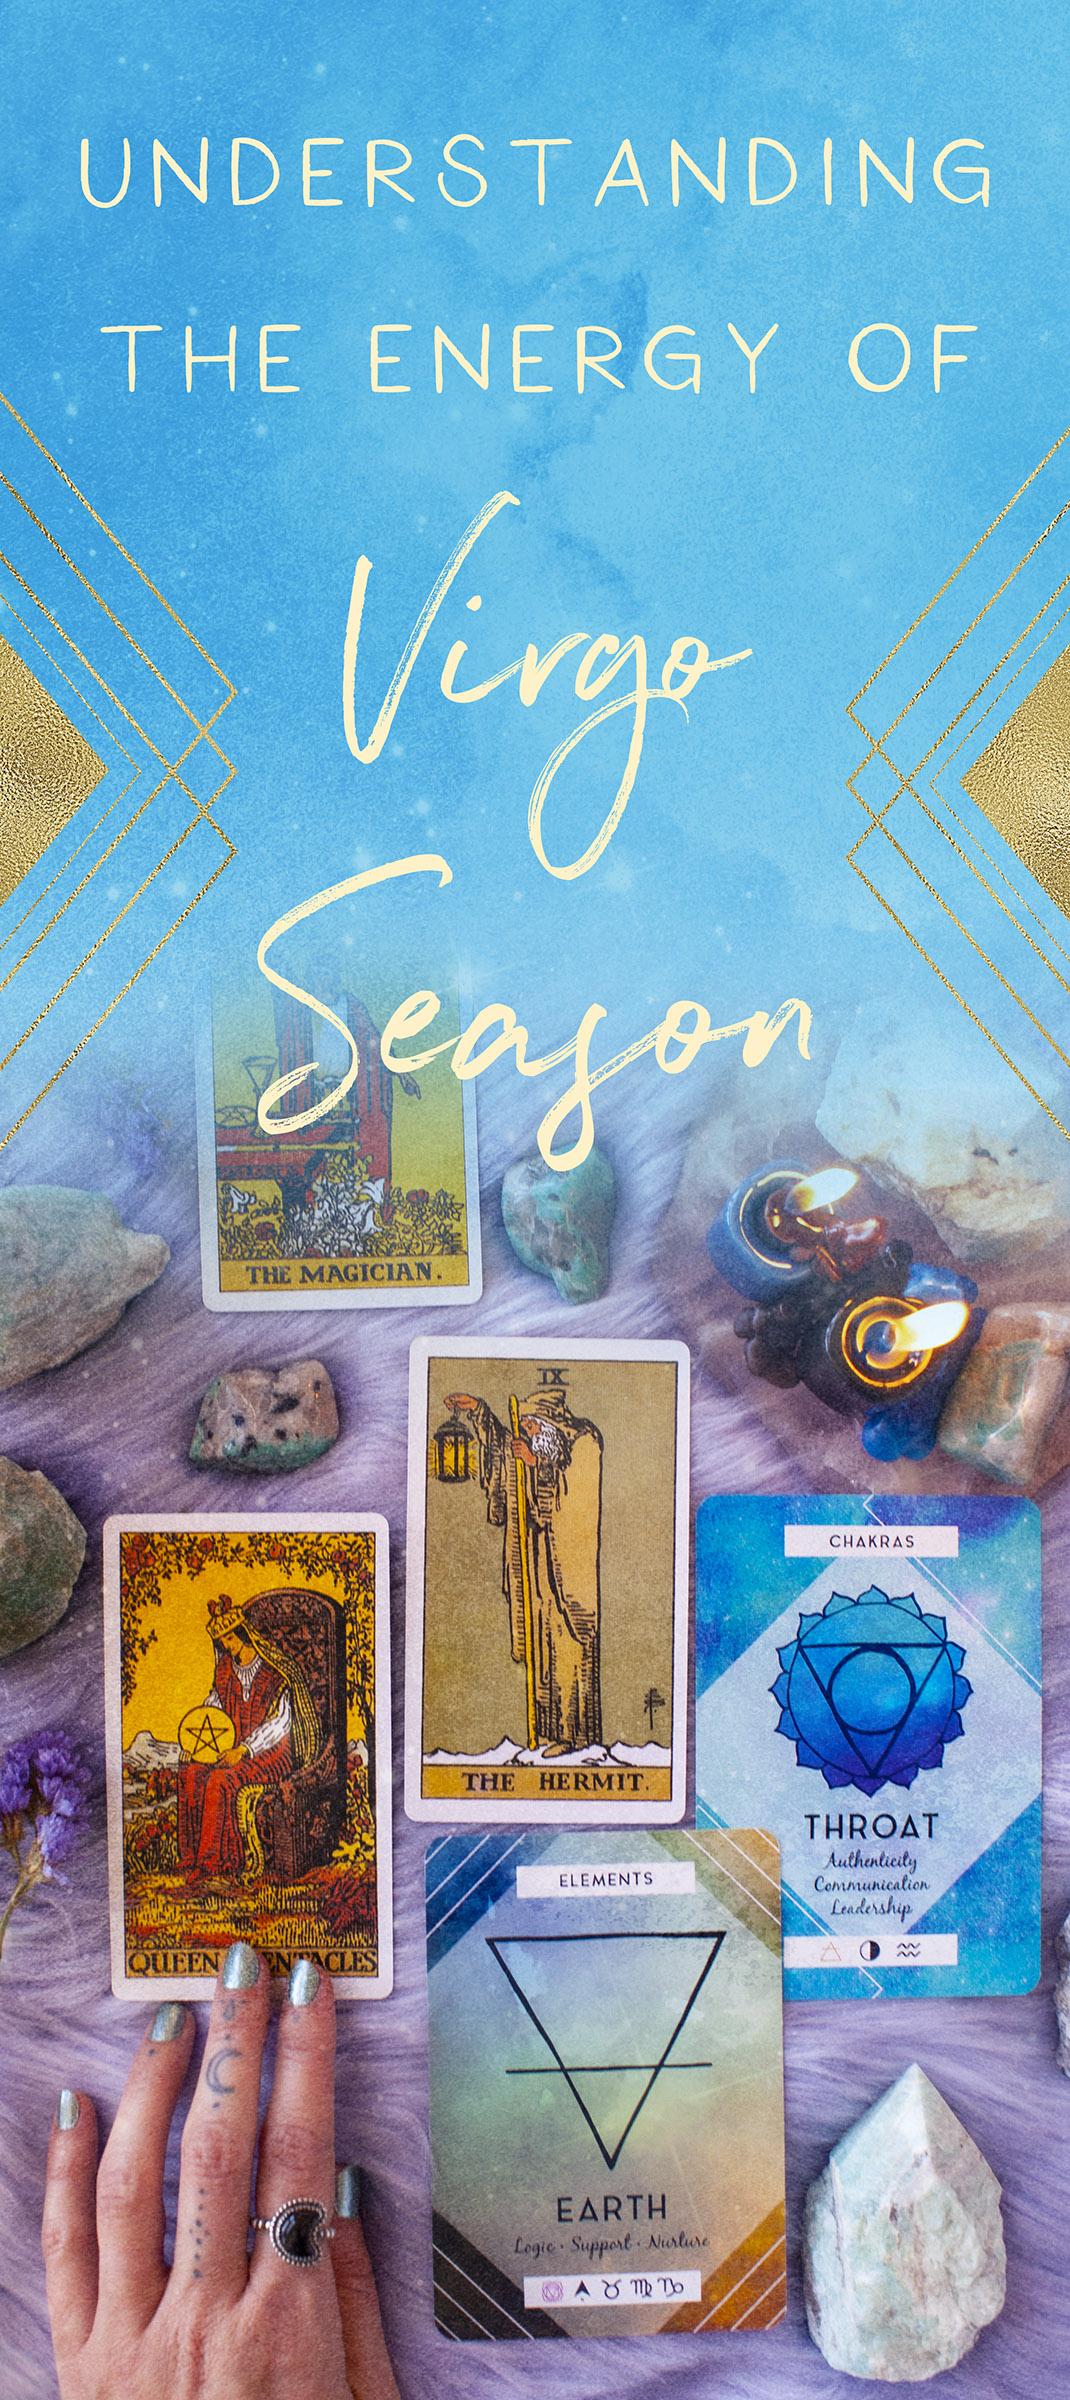 understanding the energy of virgo season long pic